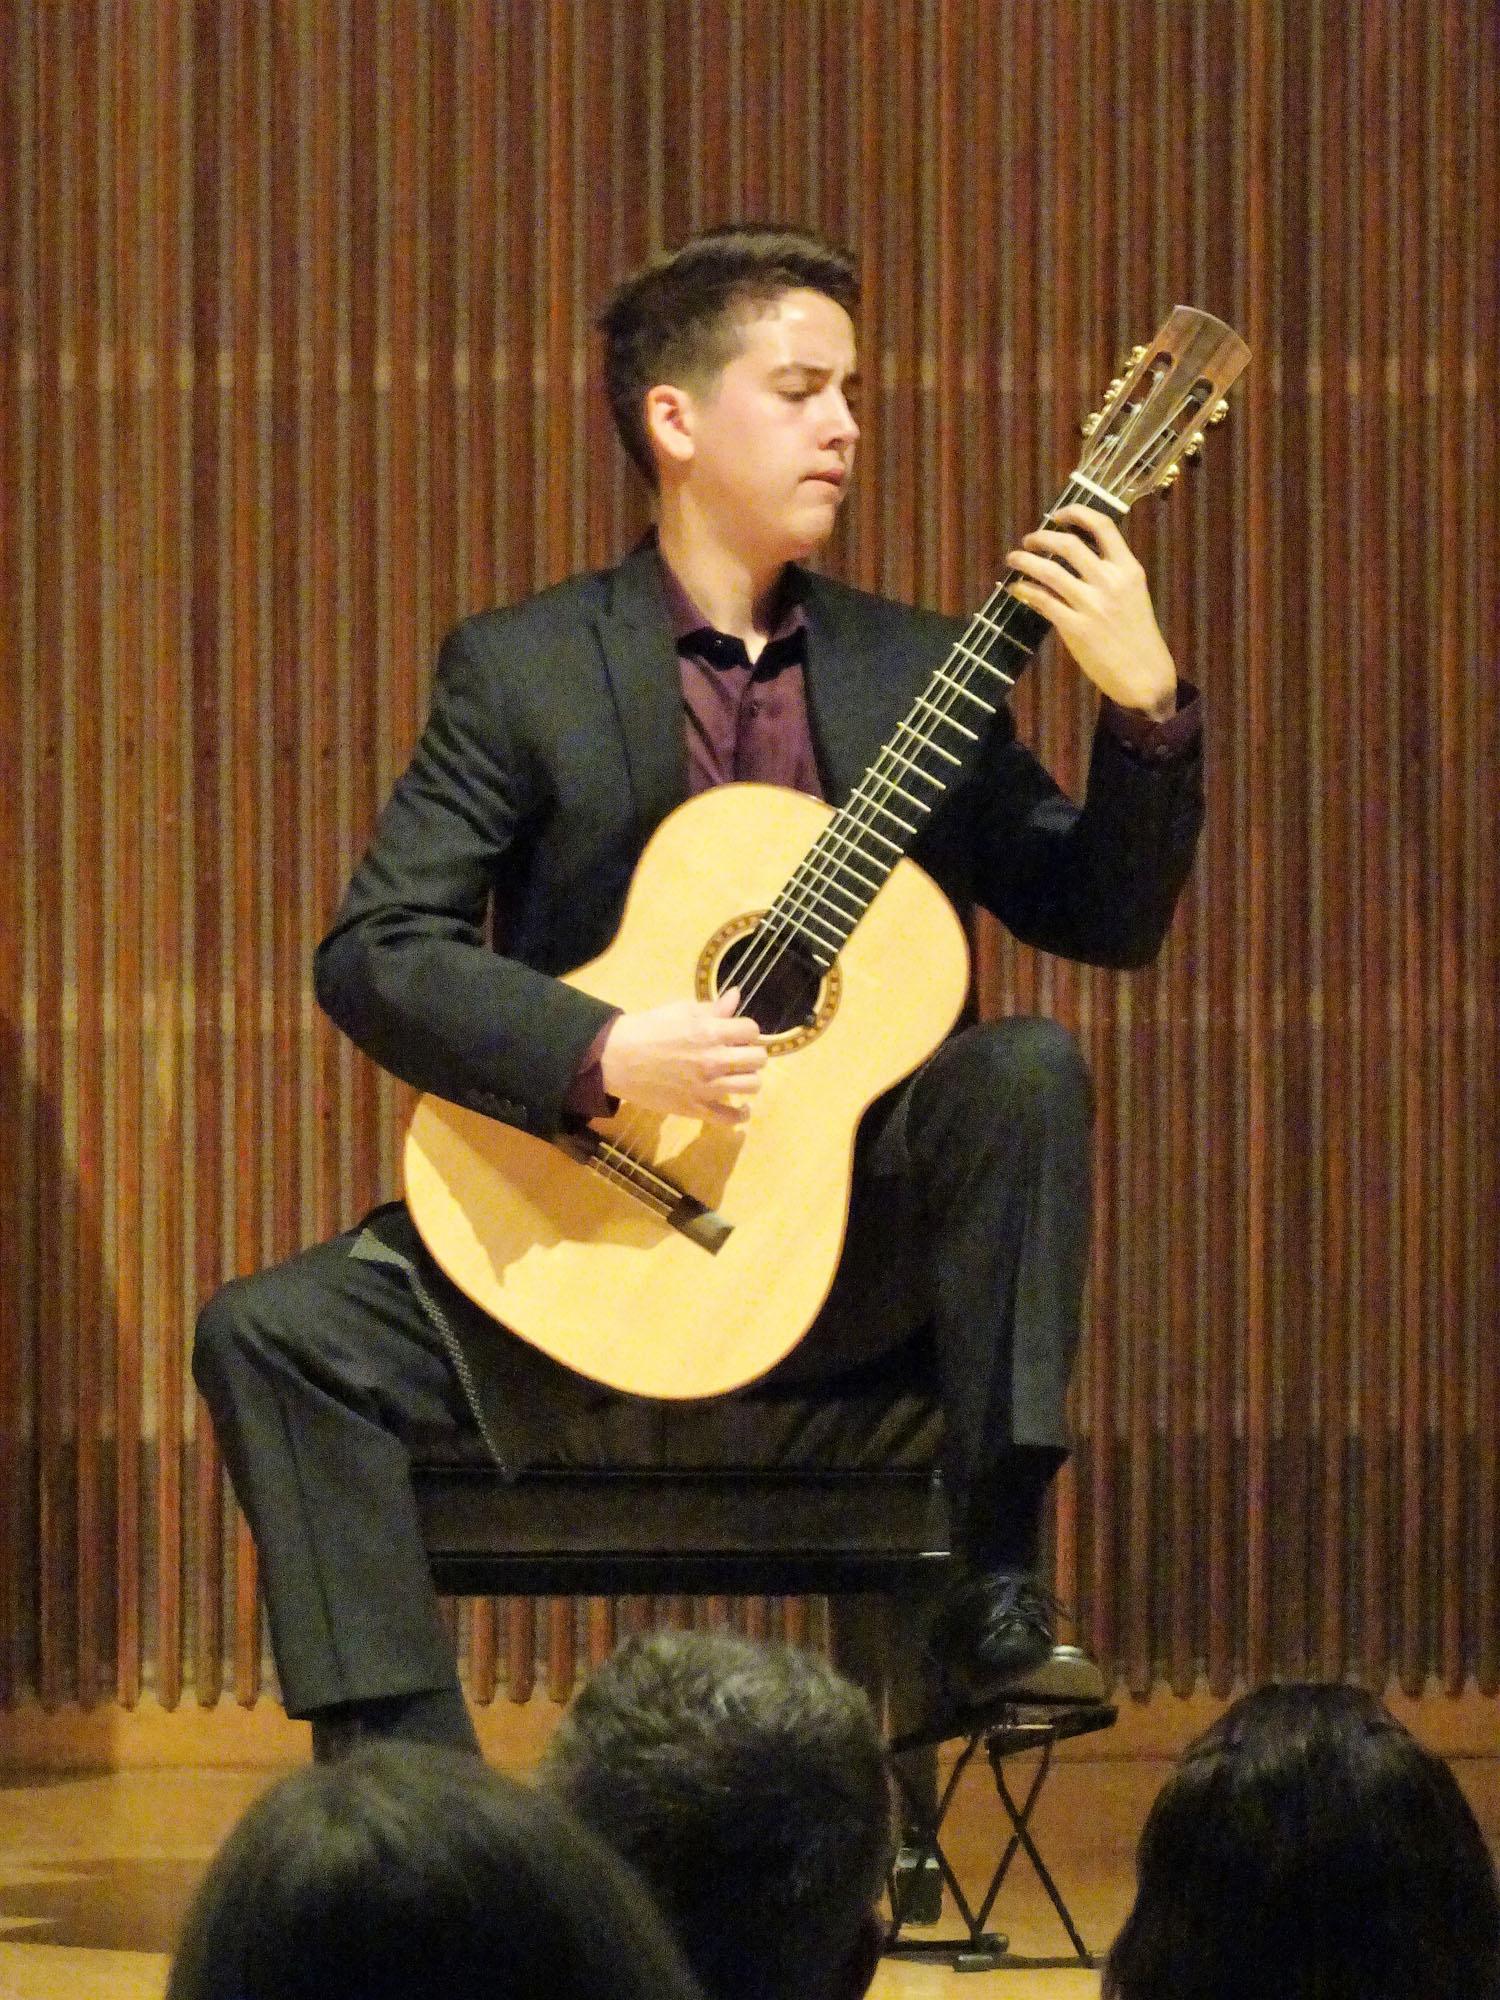 Xavier Jara on stage in Kulas Recital Hall